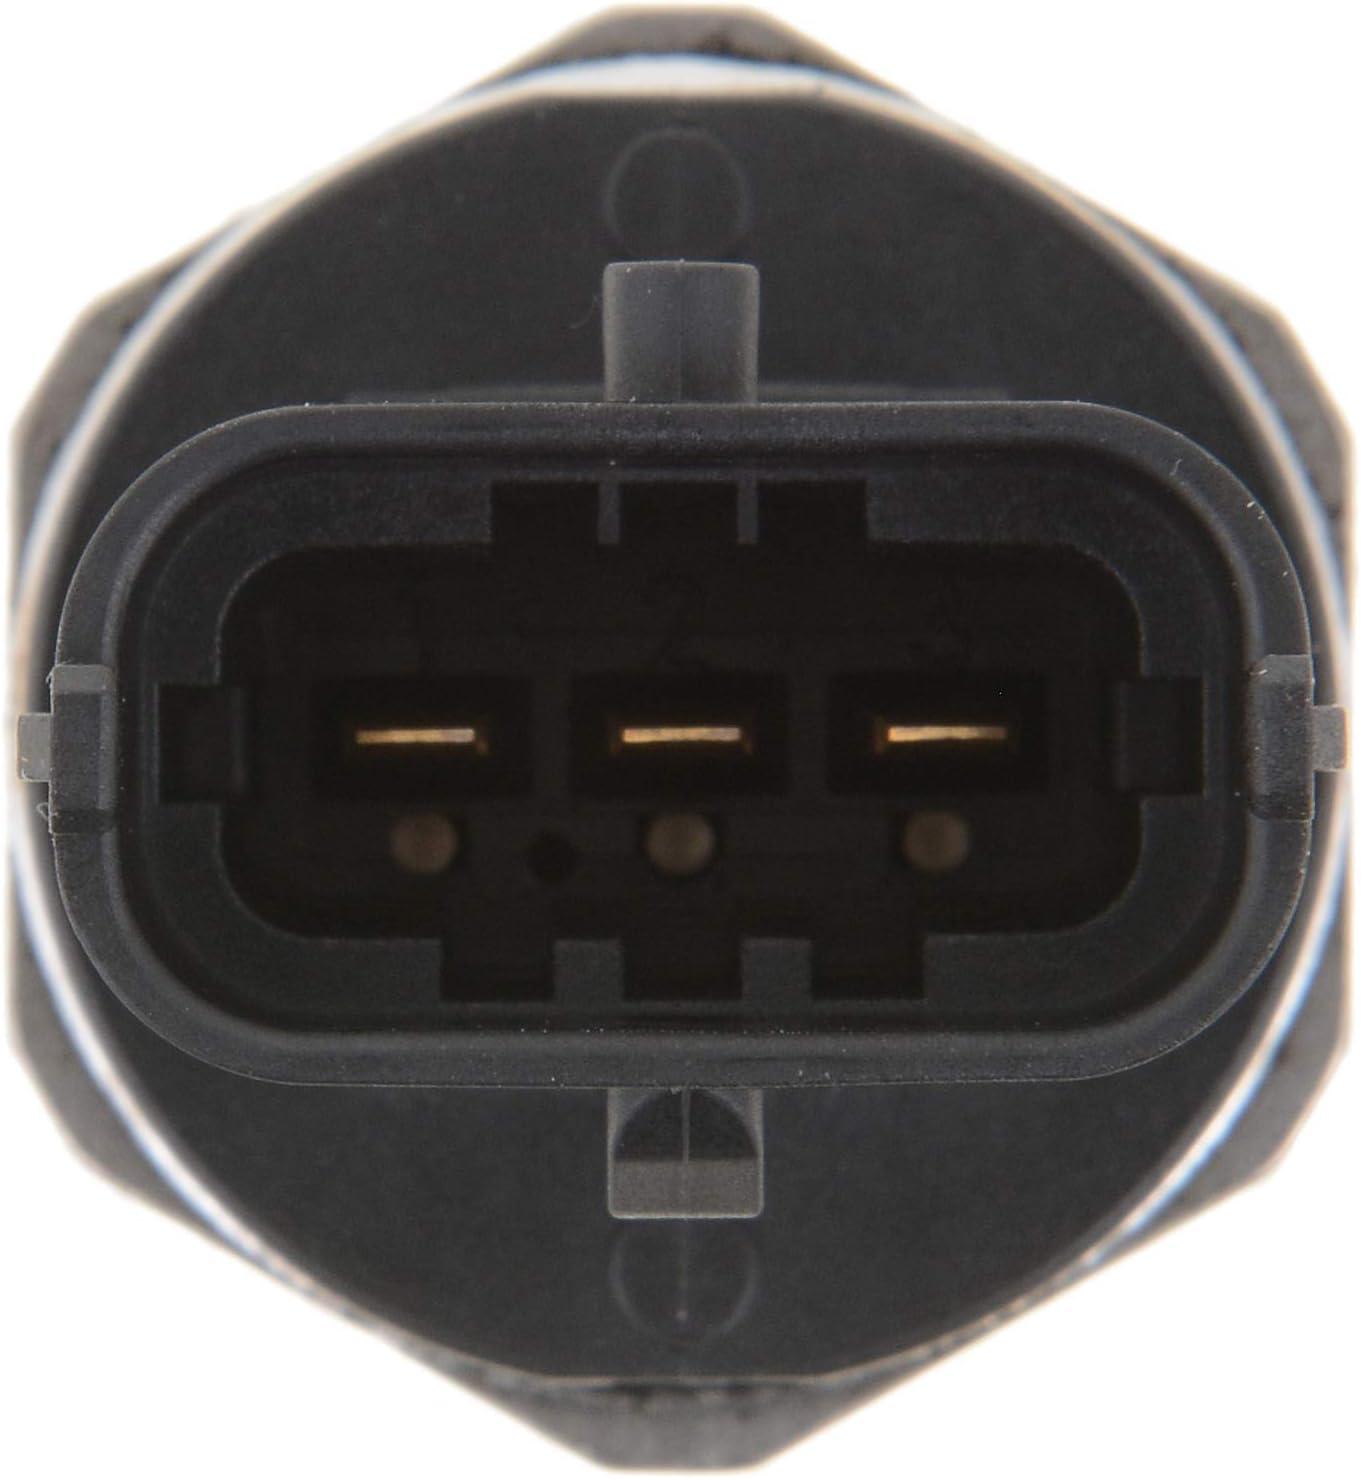 Bosch Automotive 0281006325 OEM Pressure 4 years warranty Select Very popular 2003- Sensor for